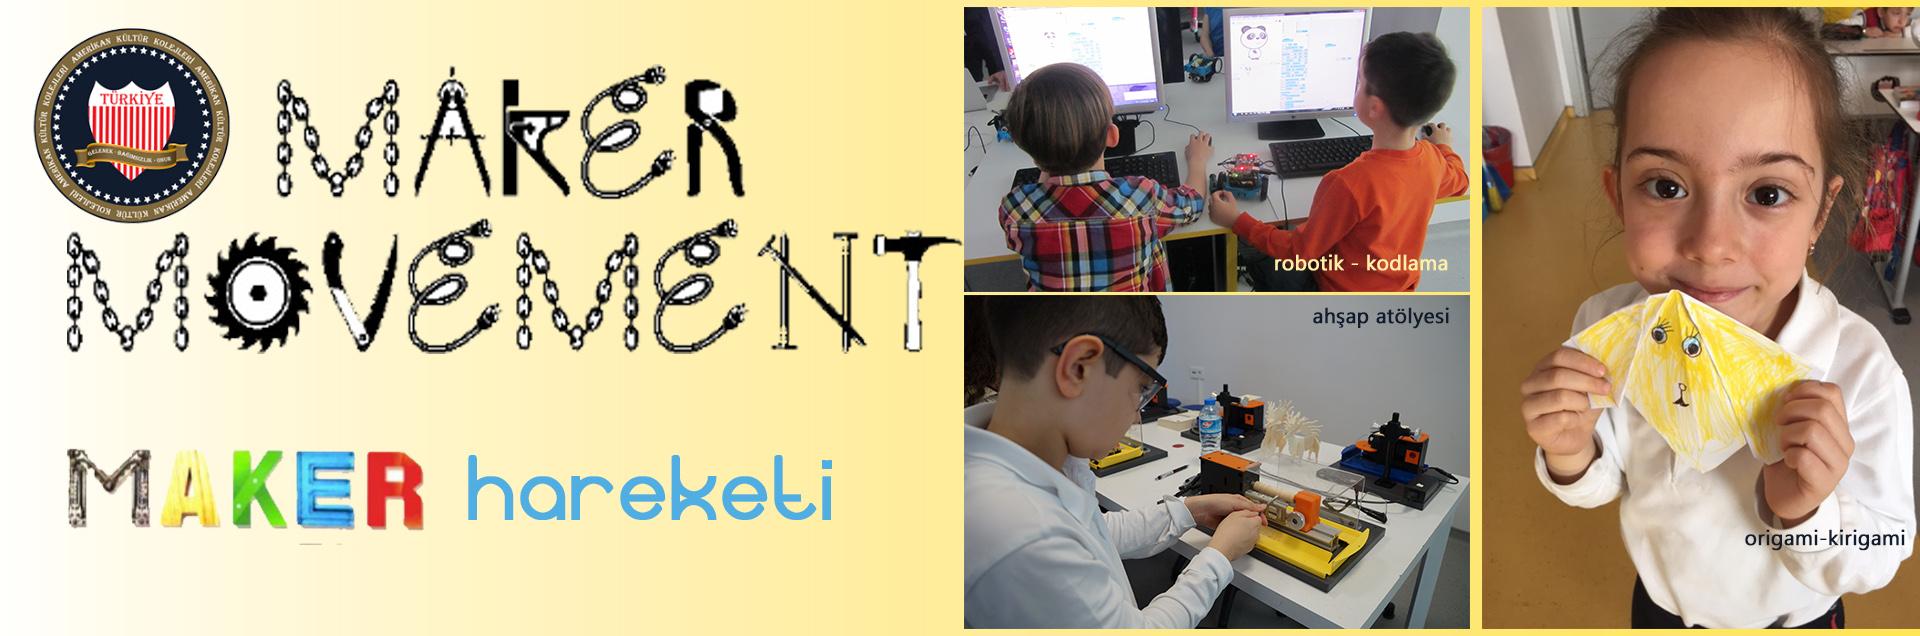 makerhareketi2